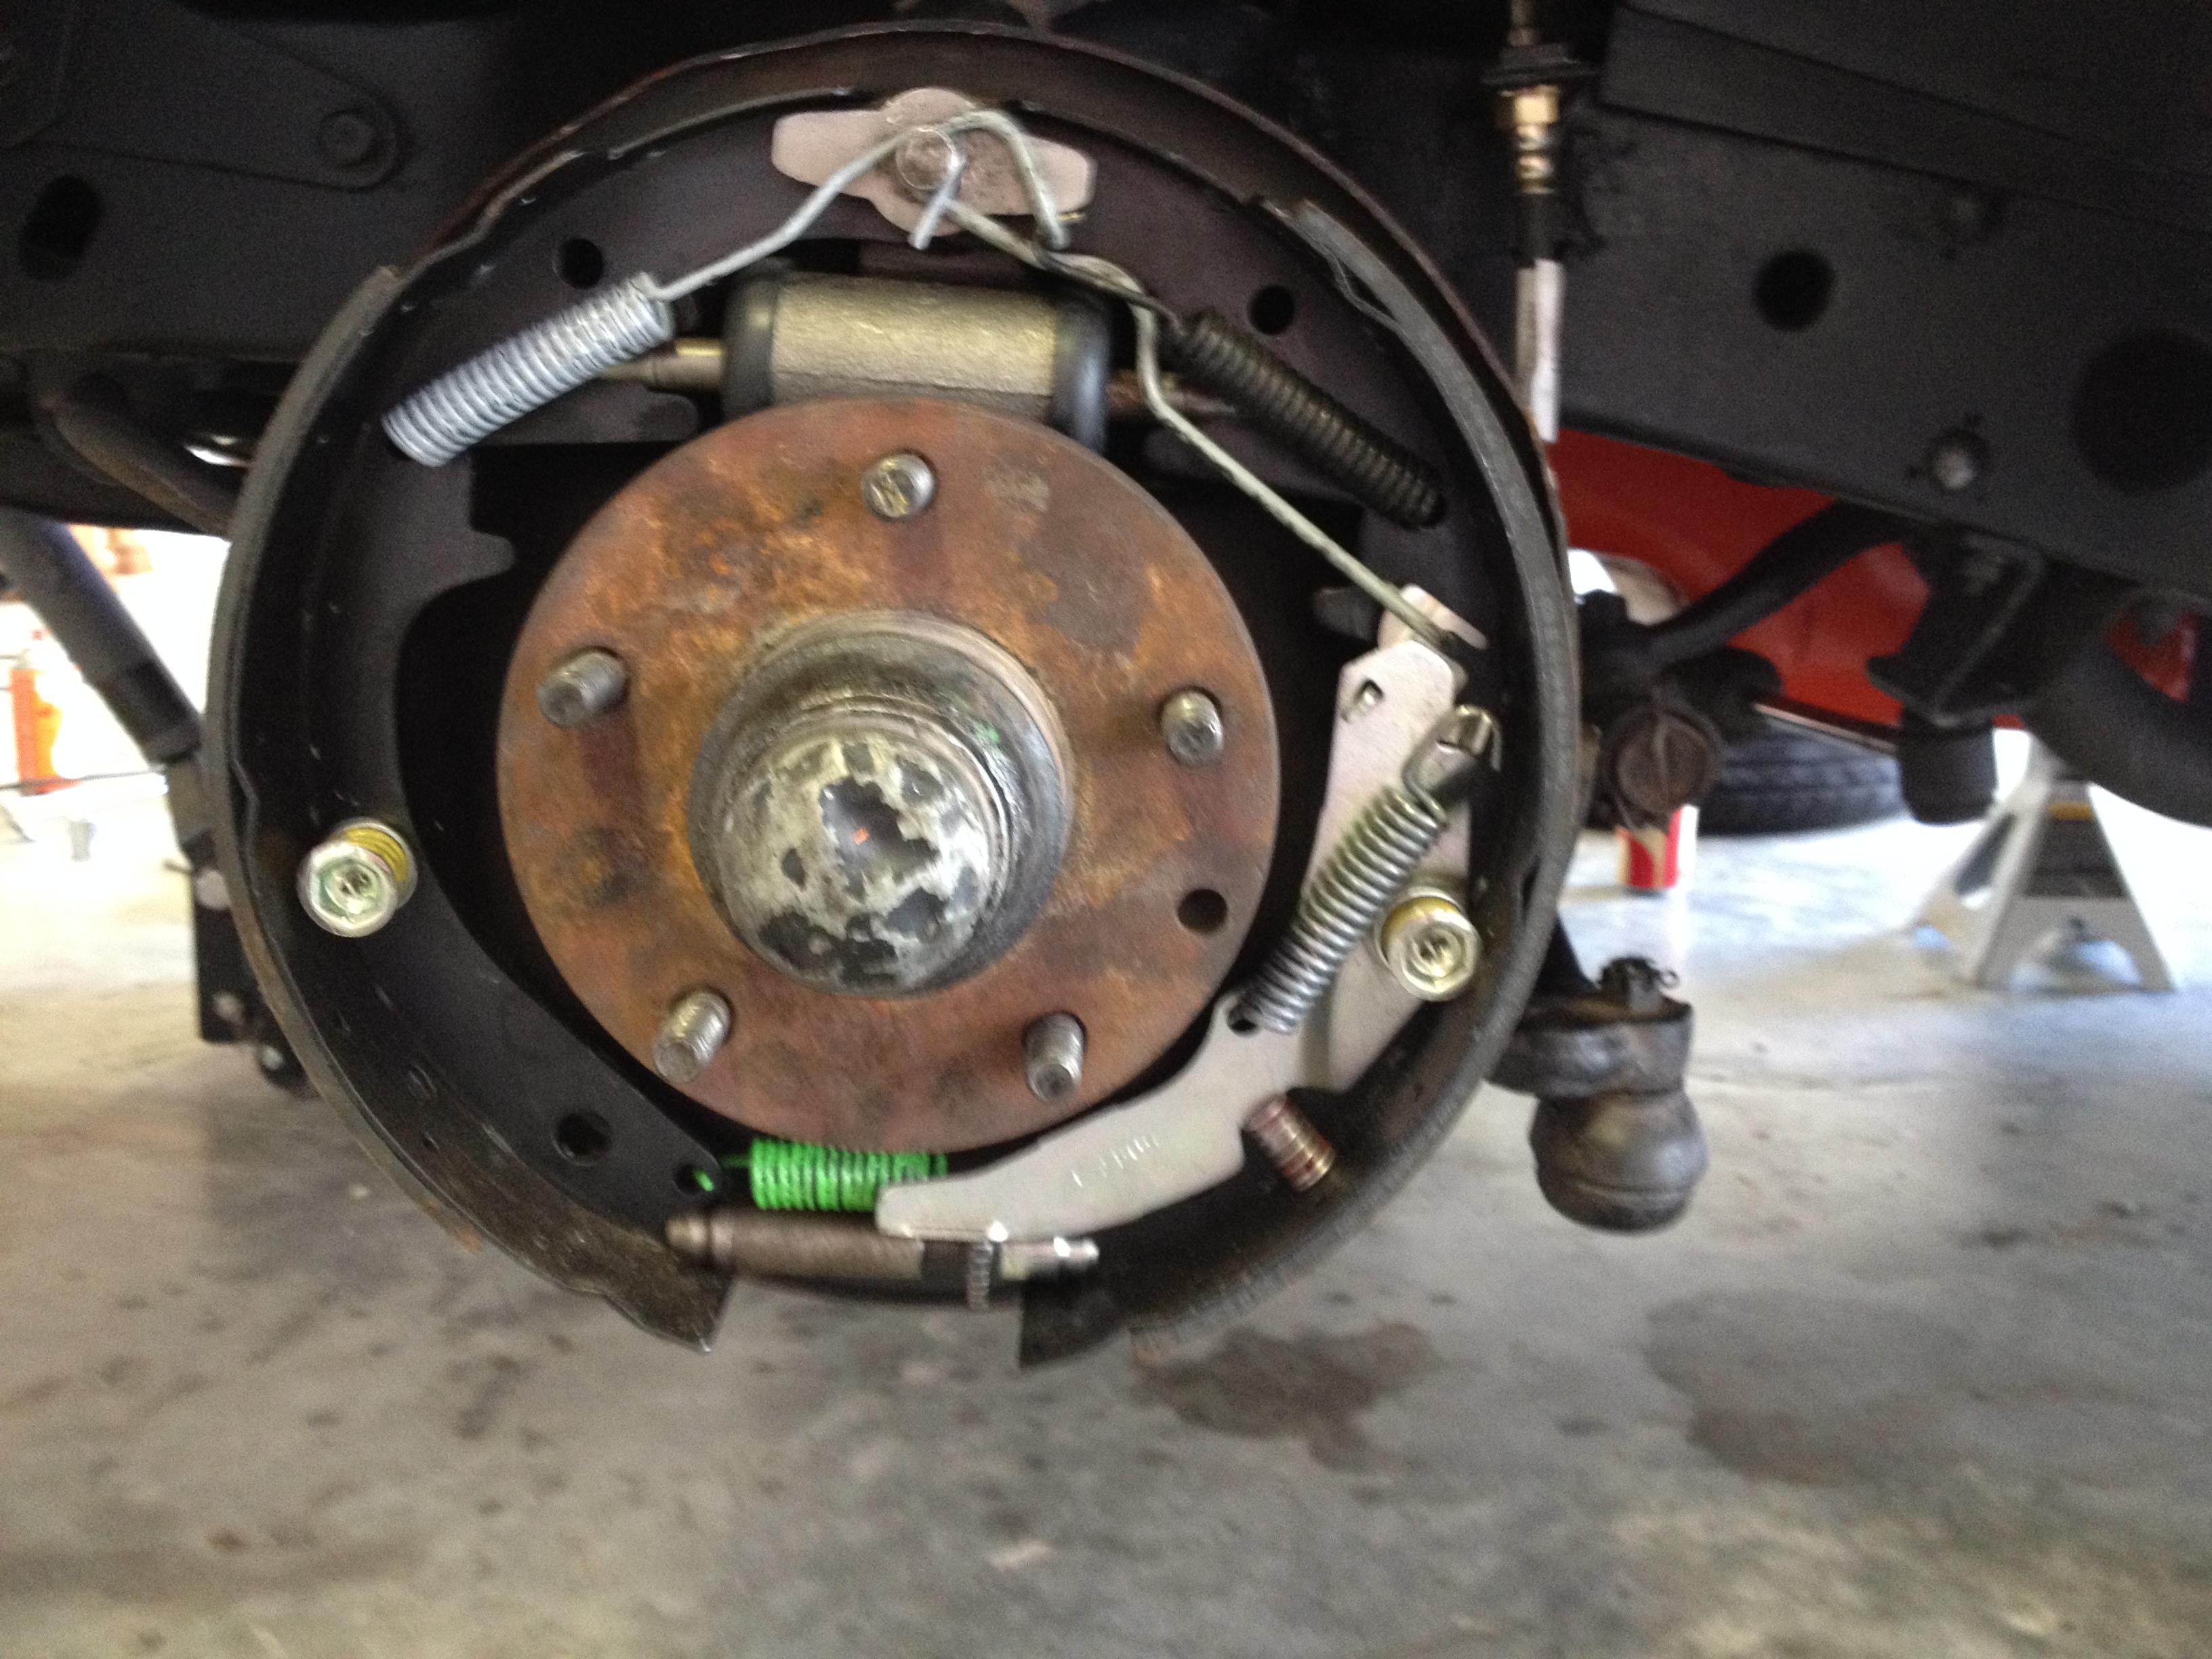 chevy drum brakes diagram warn winch bolt pattern overhauling front on a 64 corvetteforum